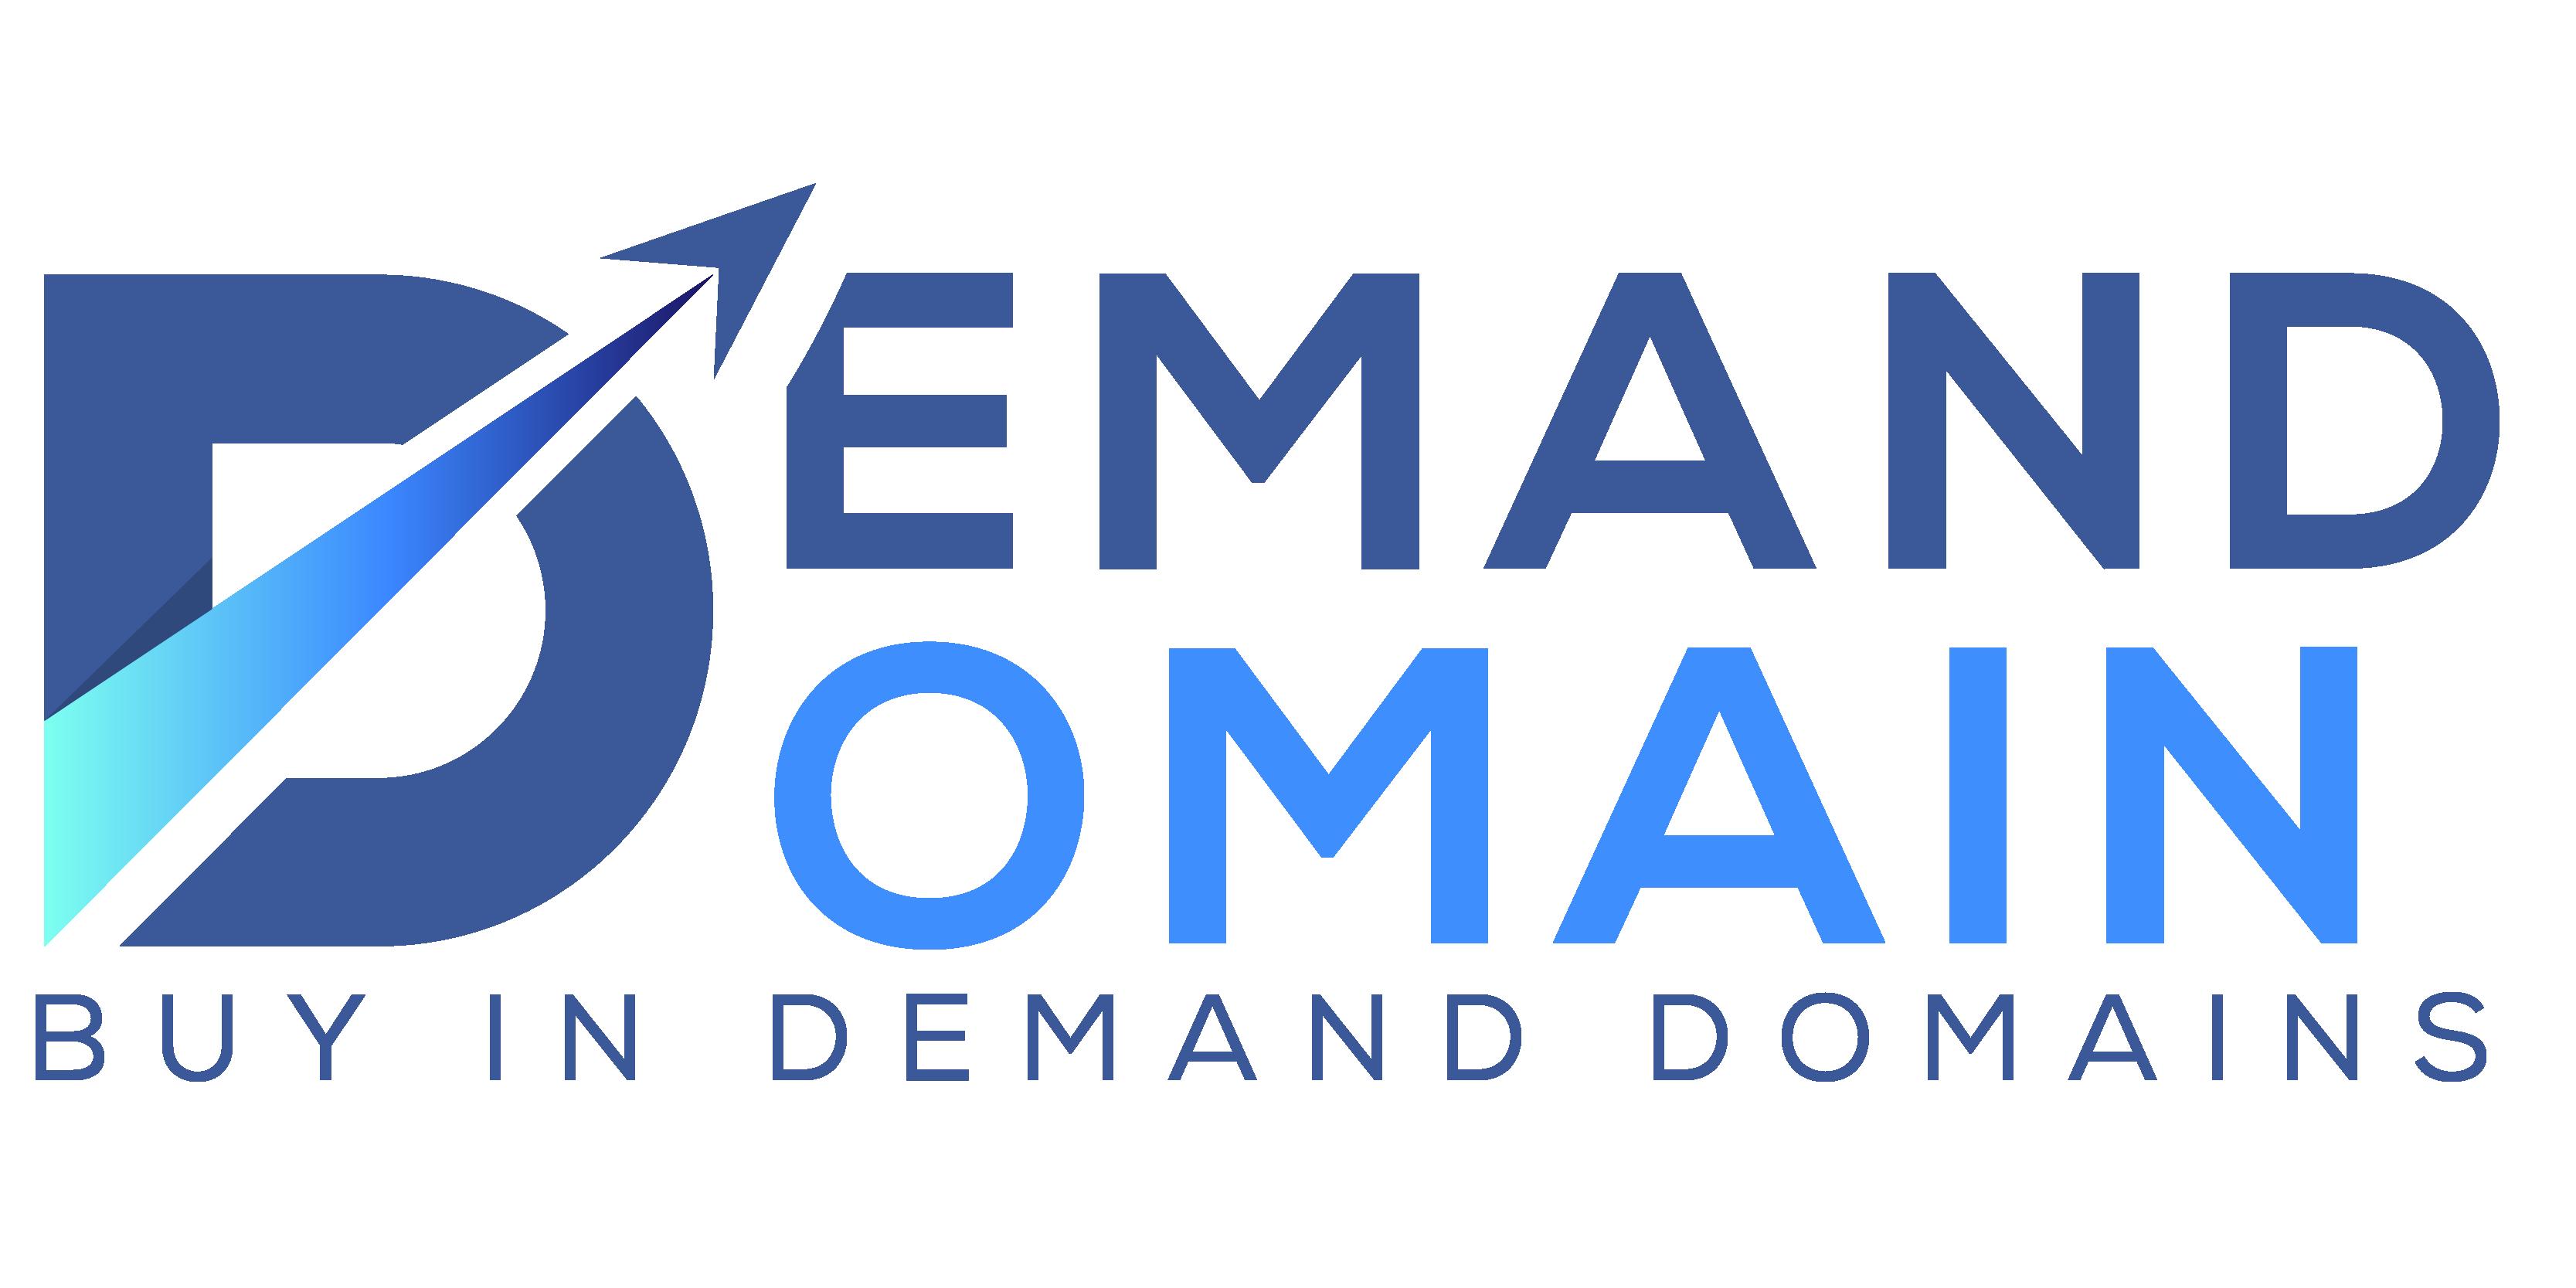 Demand Domain